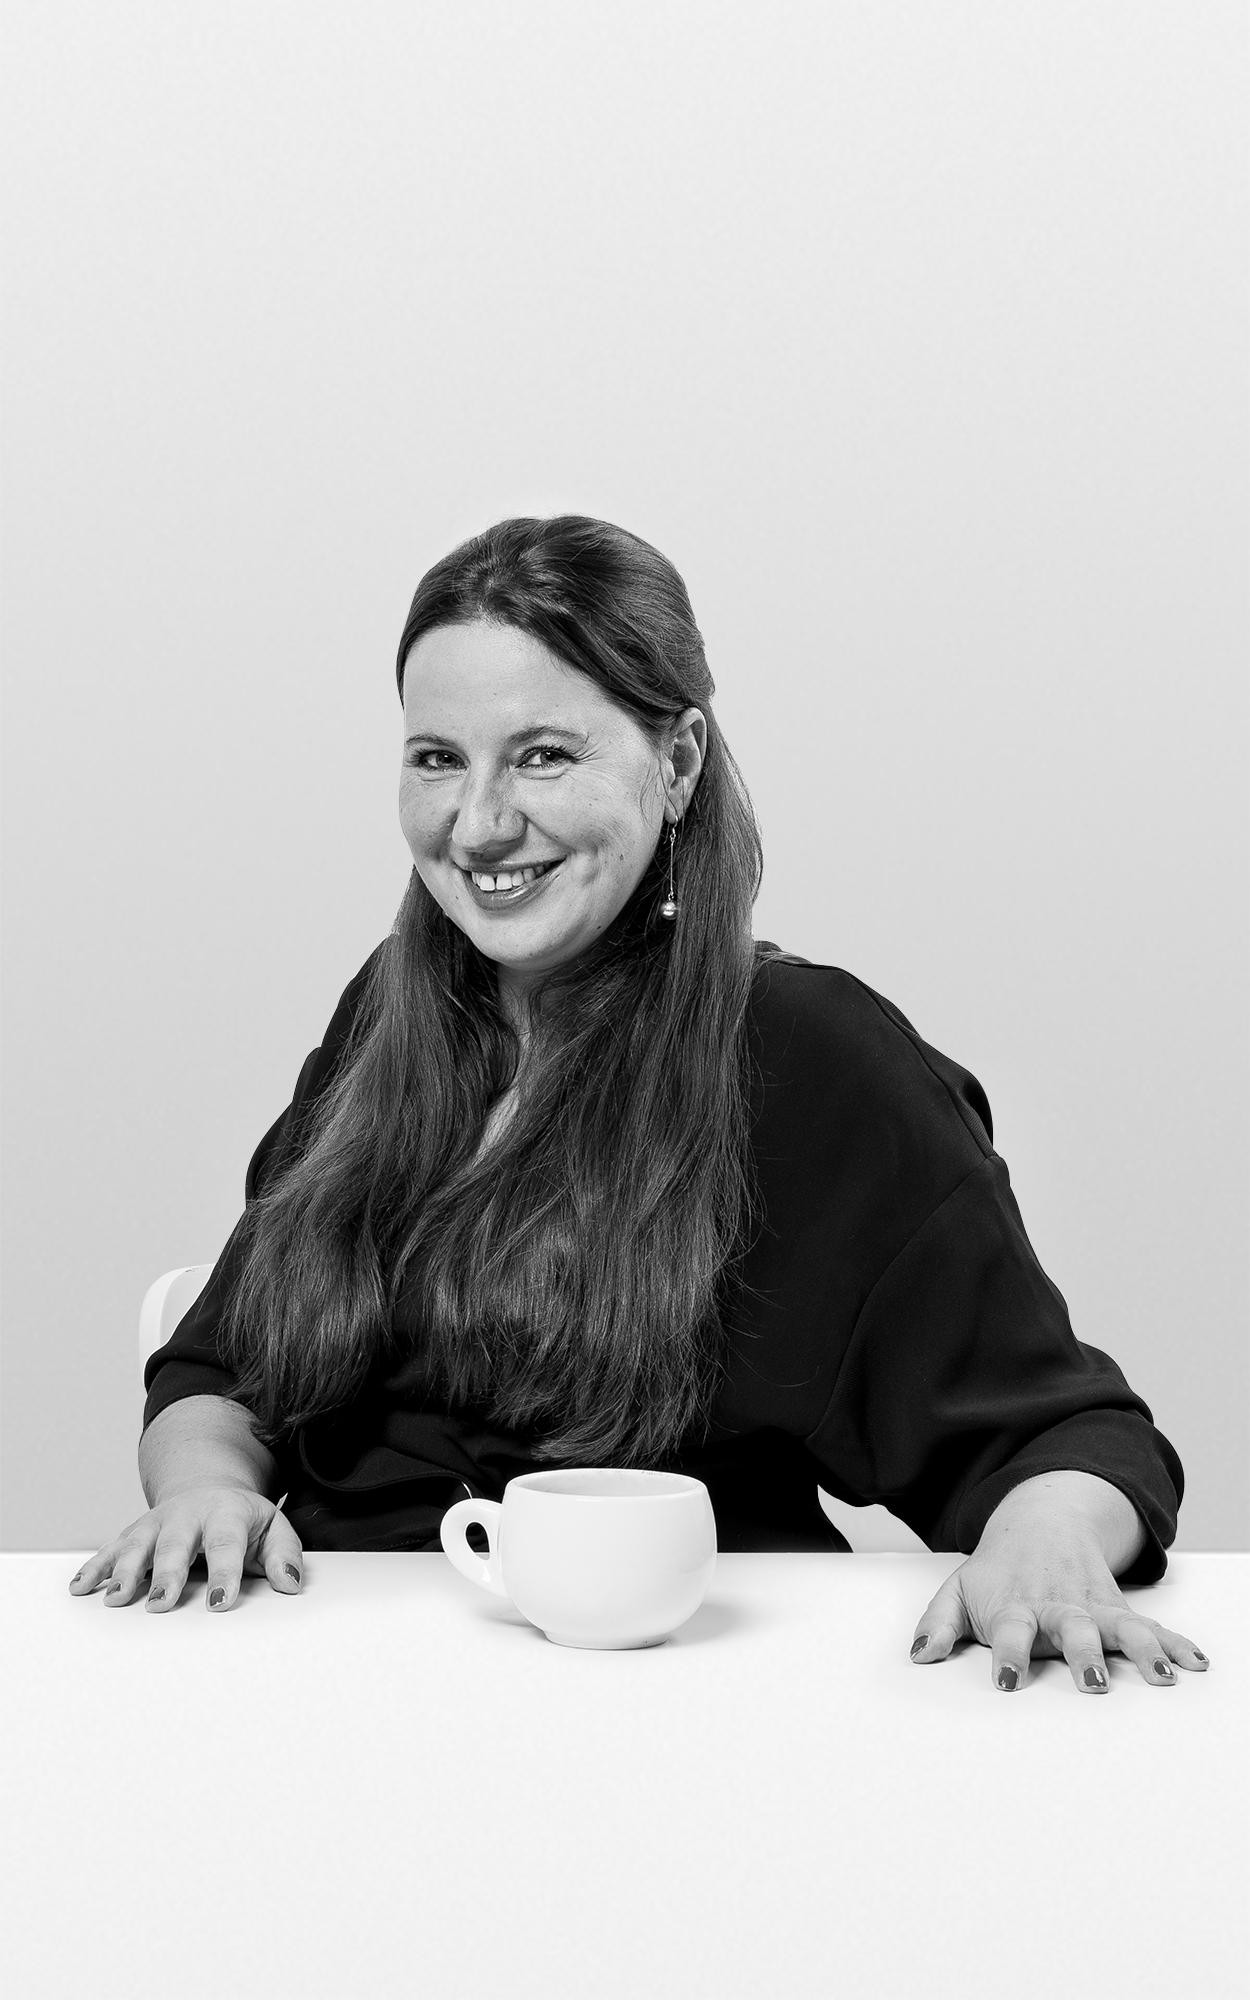 Nathalie Prospero